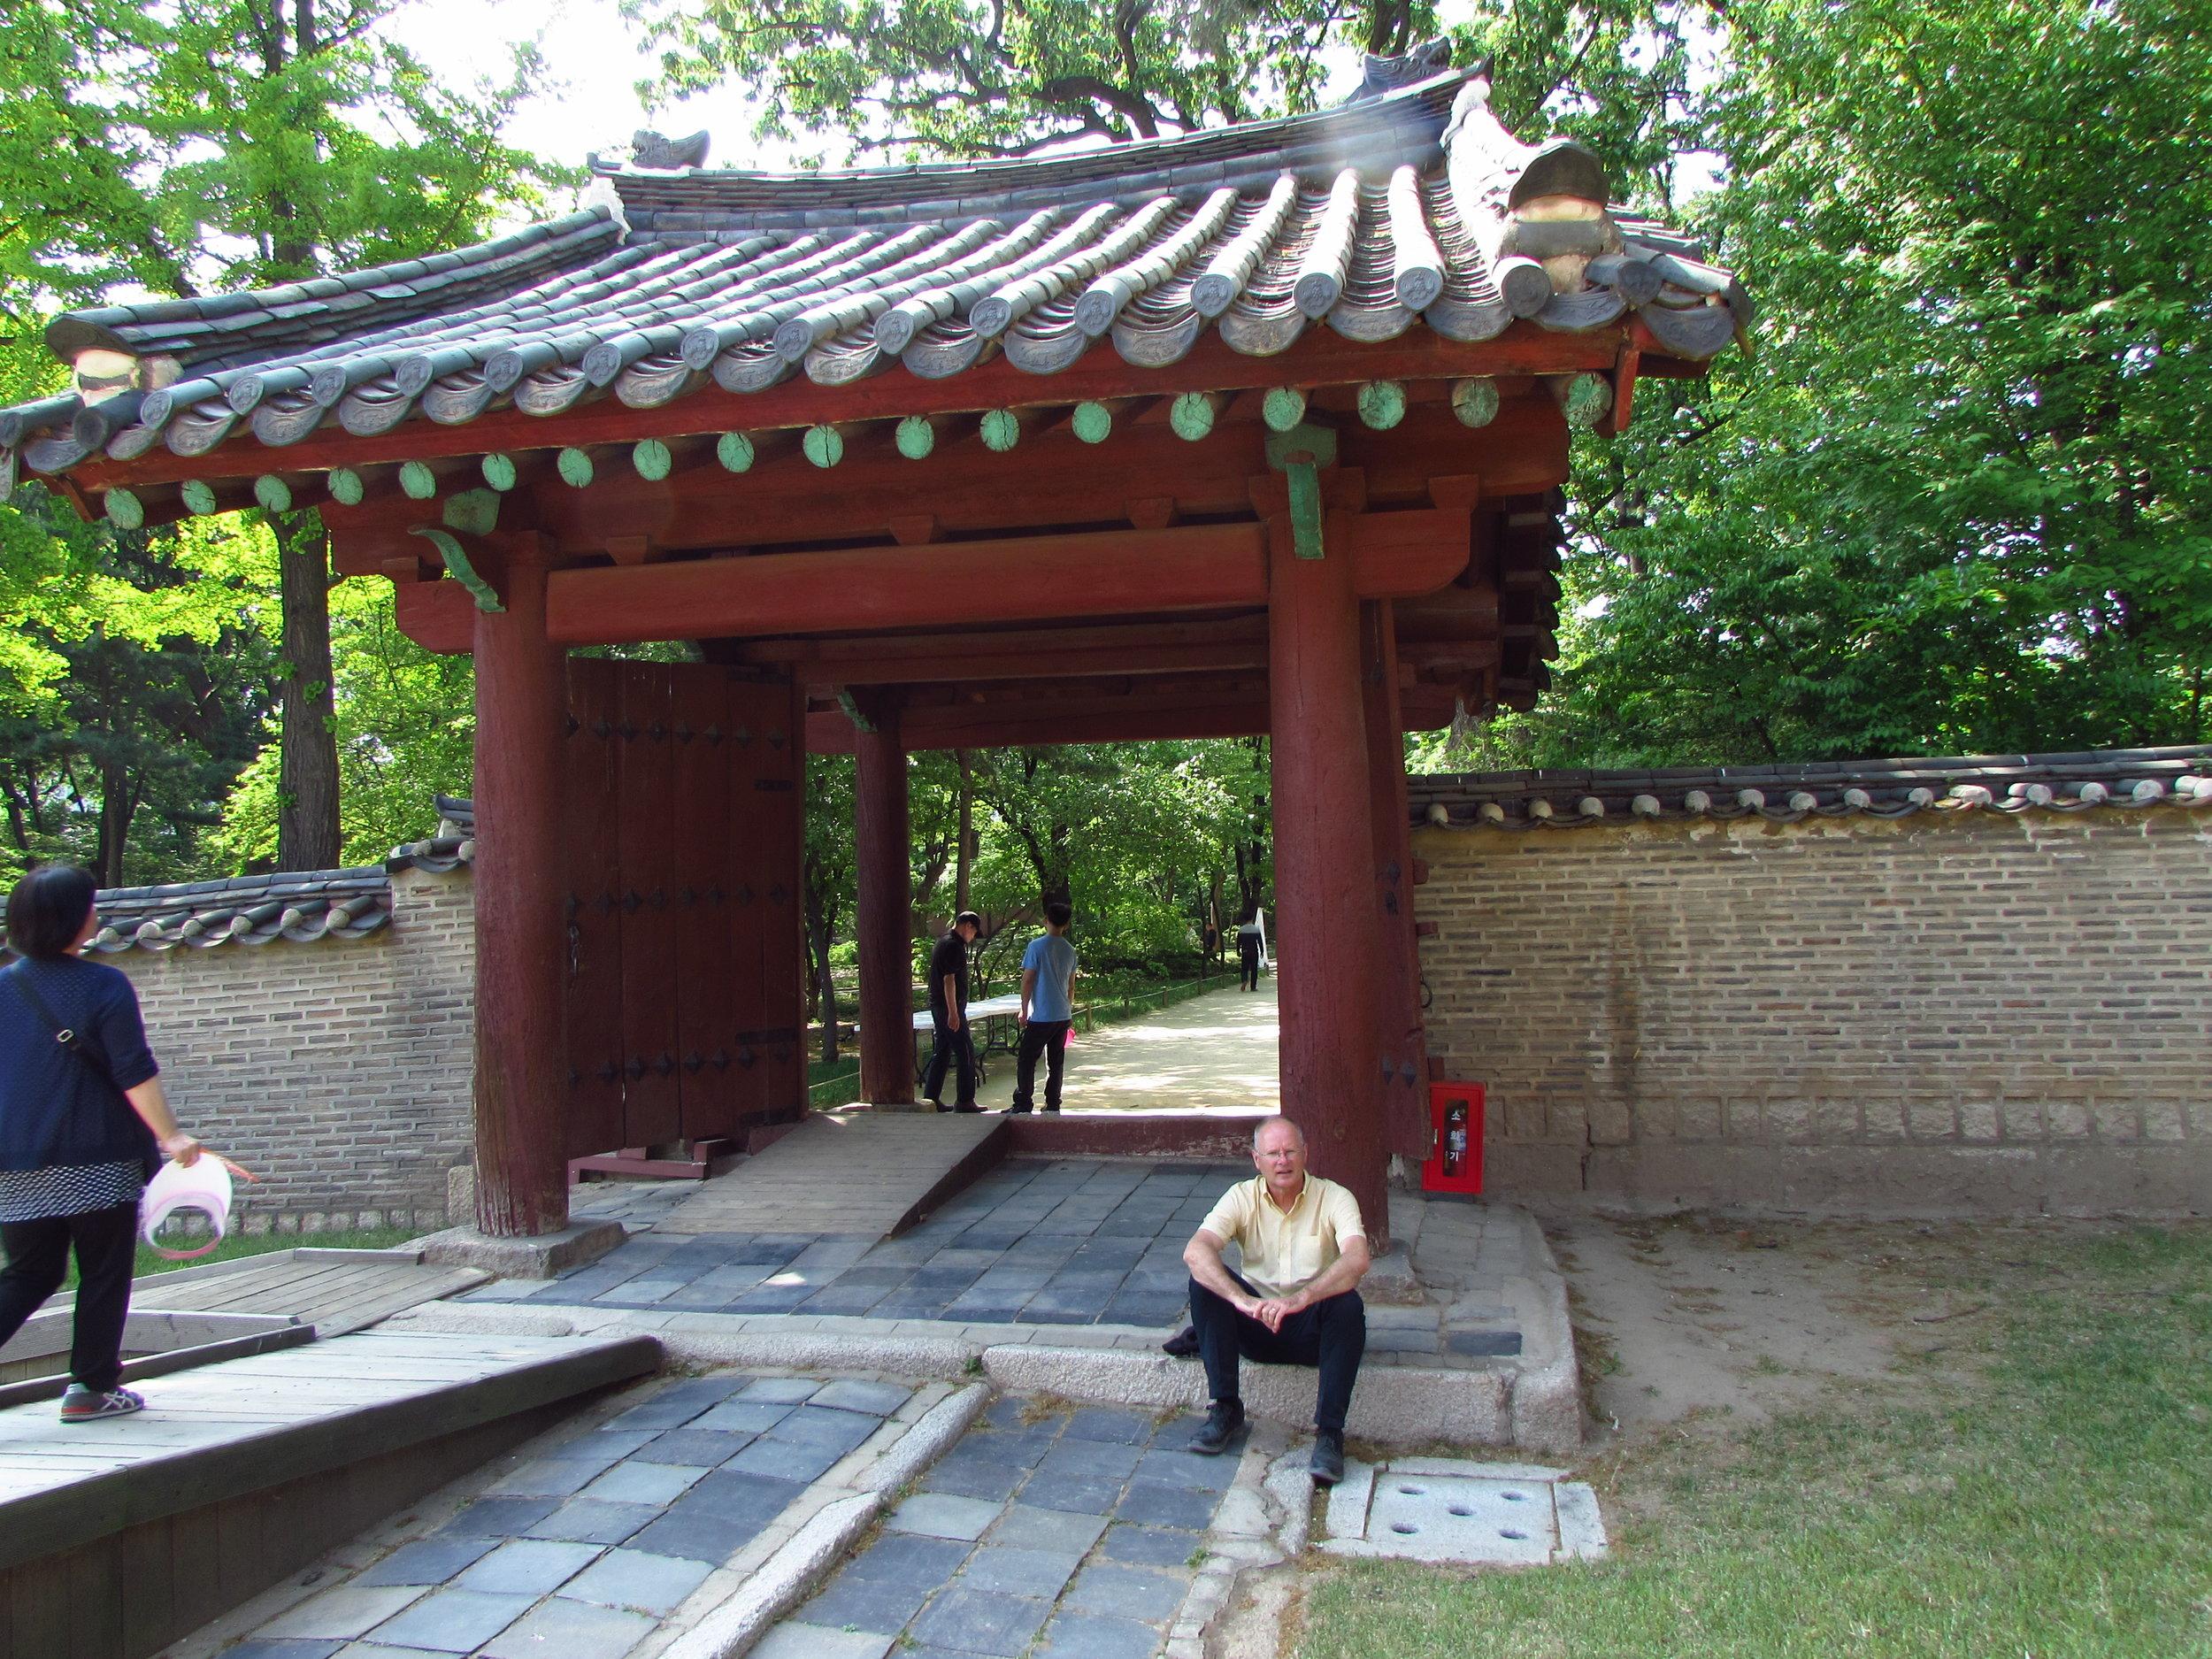 Enjoying a quiet moment at the Dongmyo Shrine